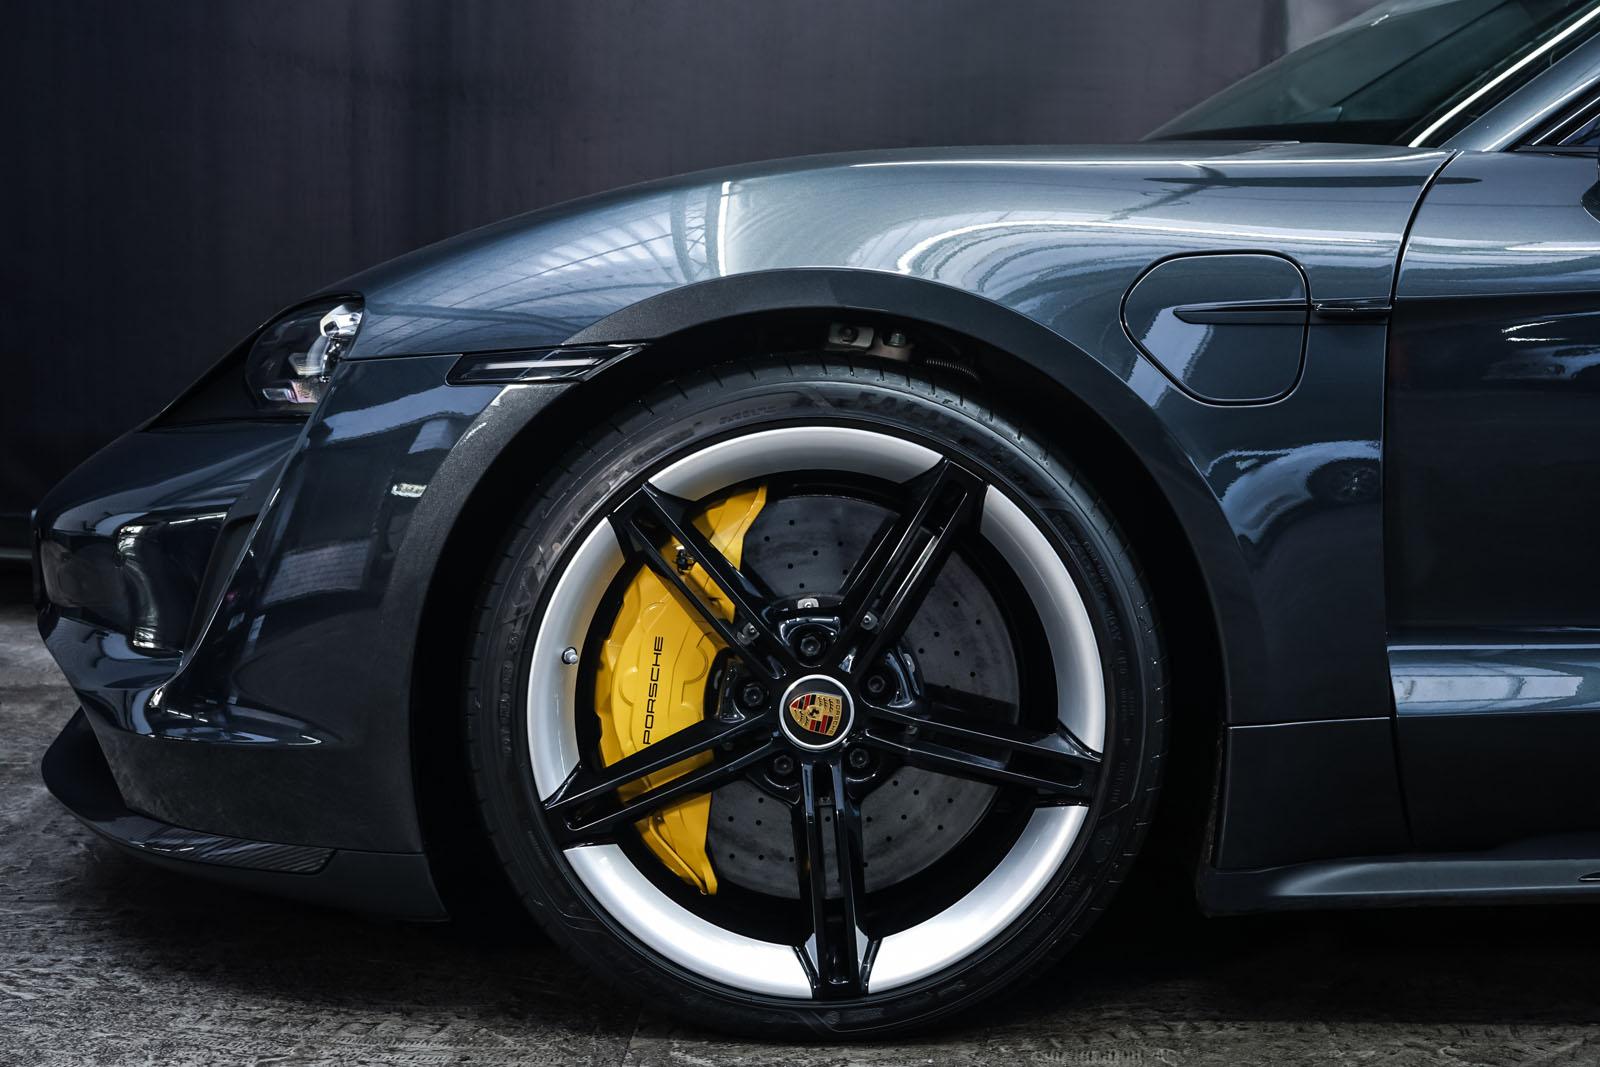 Porsche_Taycan_TurboS_Grau_Schwarz_POR-5353_3_w